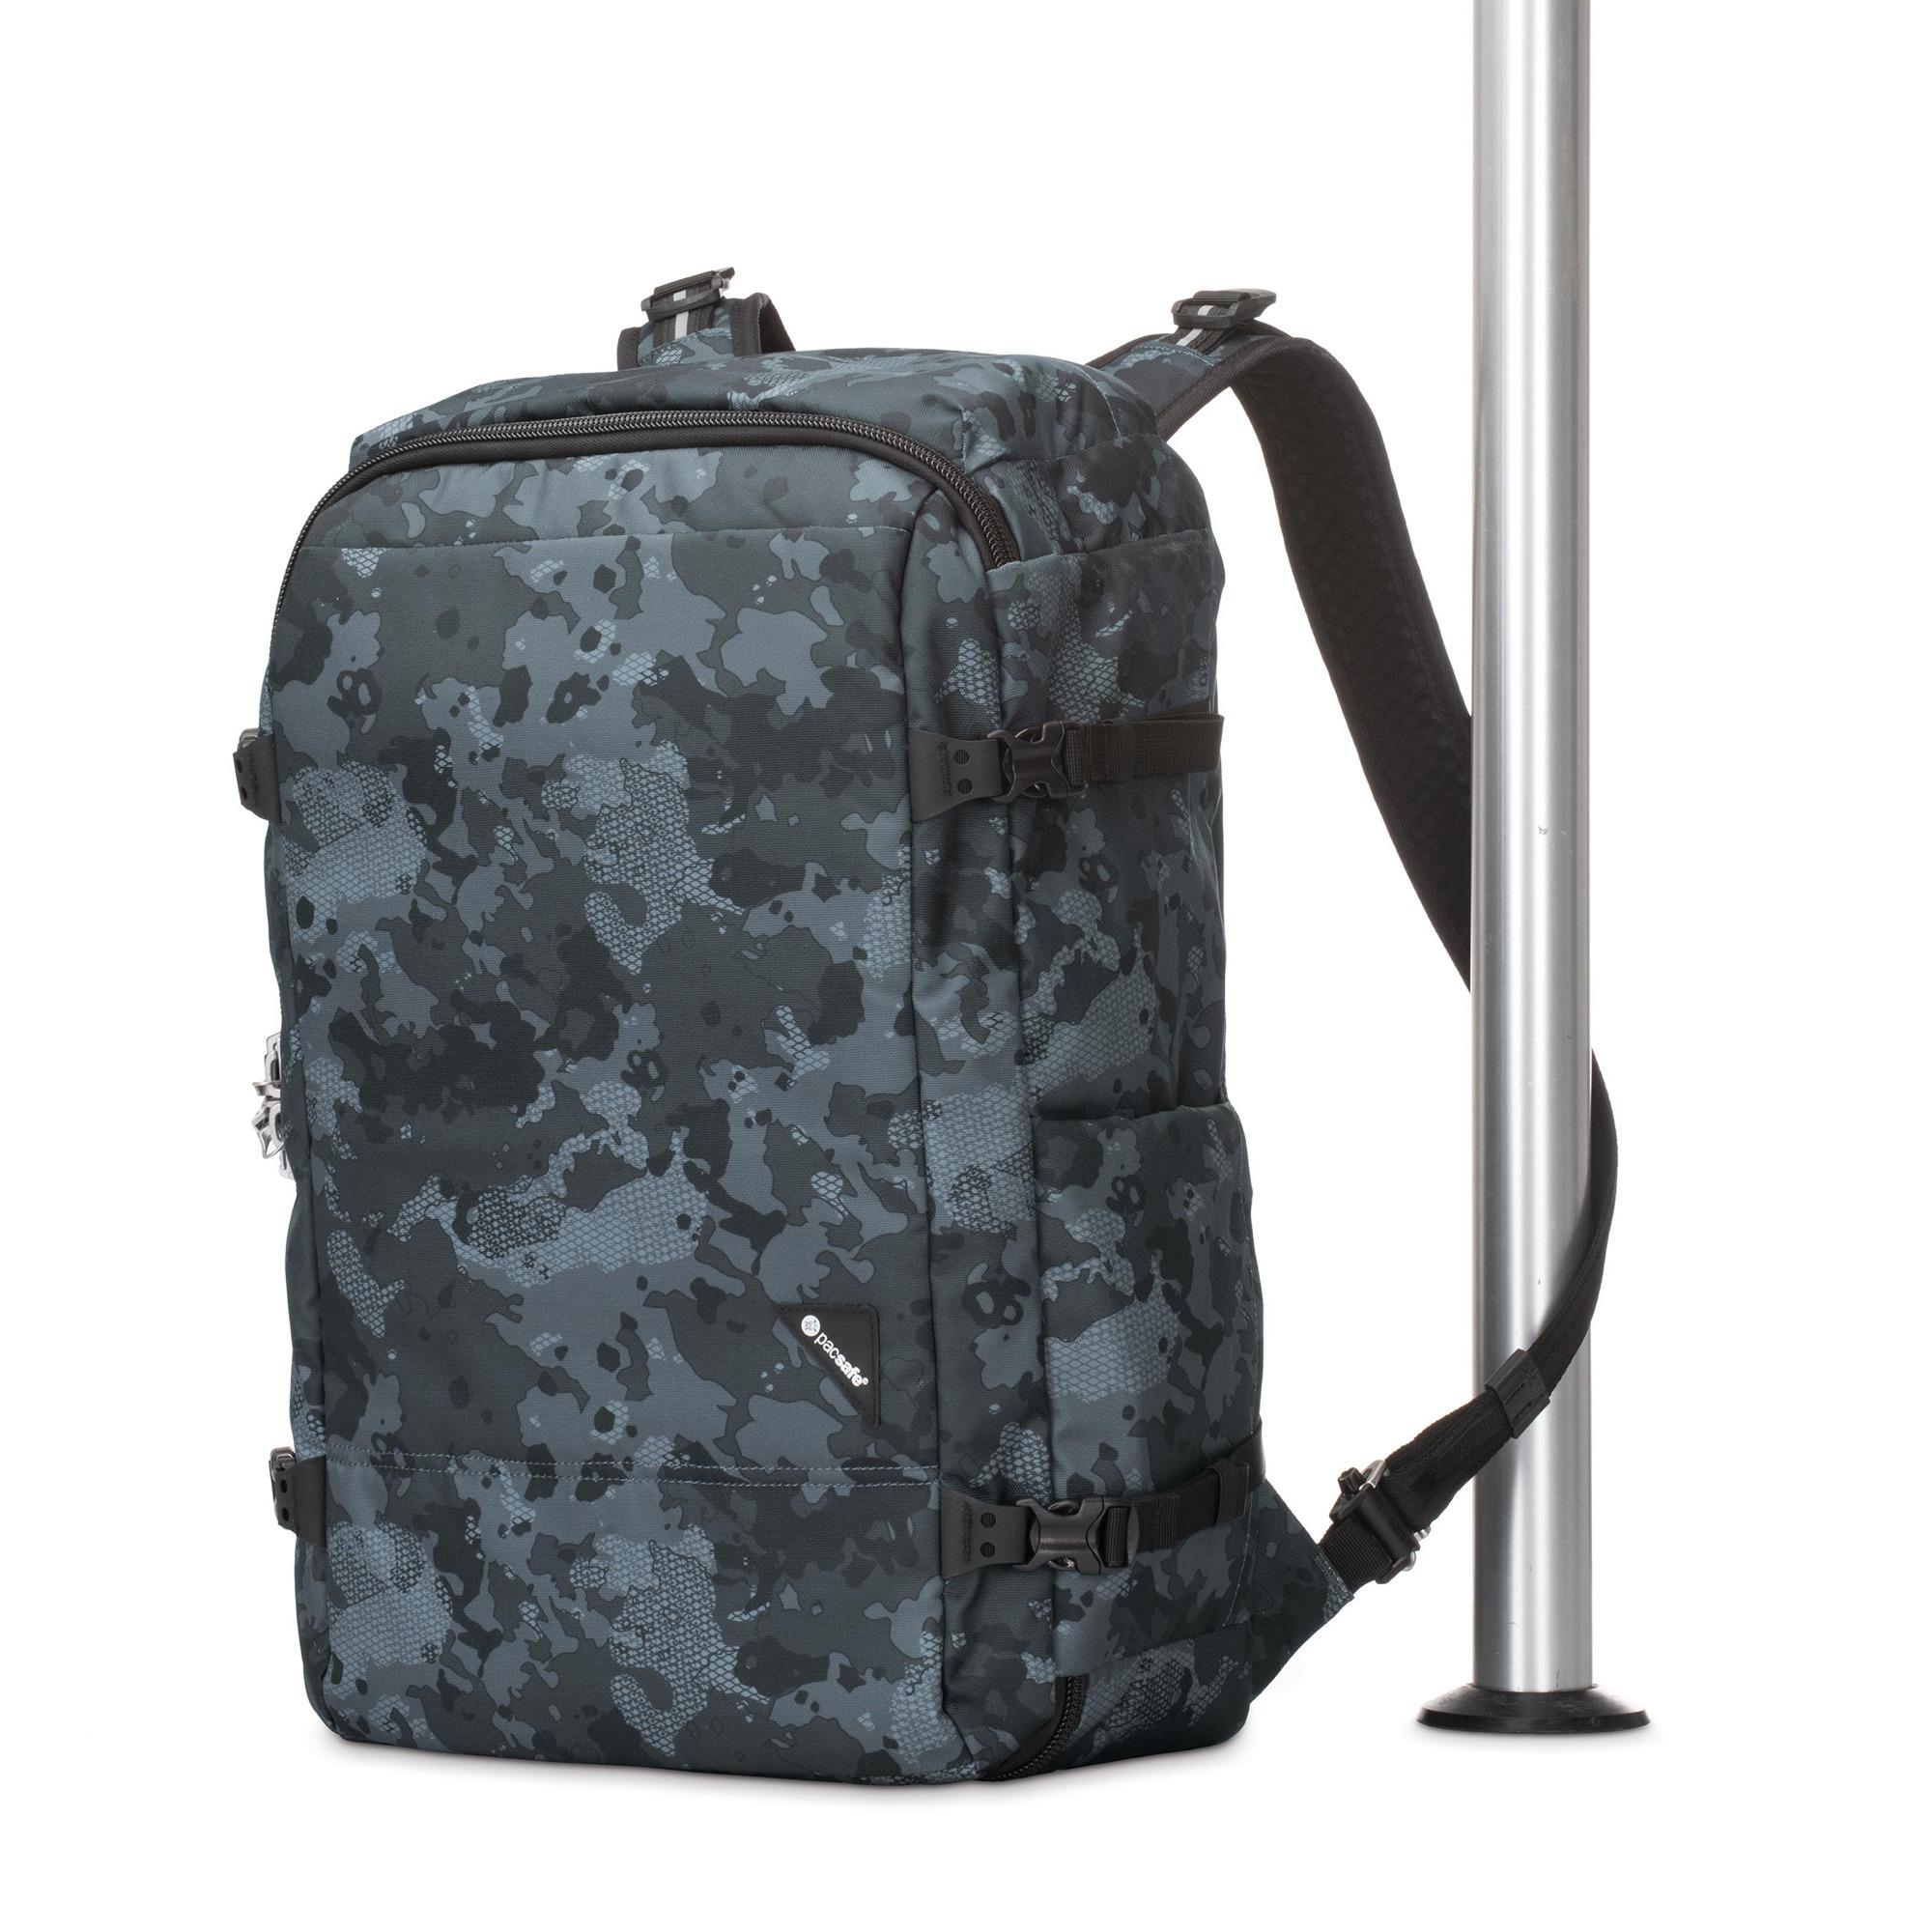 c286f7b42c96 Amazon.com  Pacsafe Vibe 40 Liter Anti Theft Carry-On Backpack ...